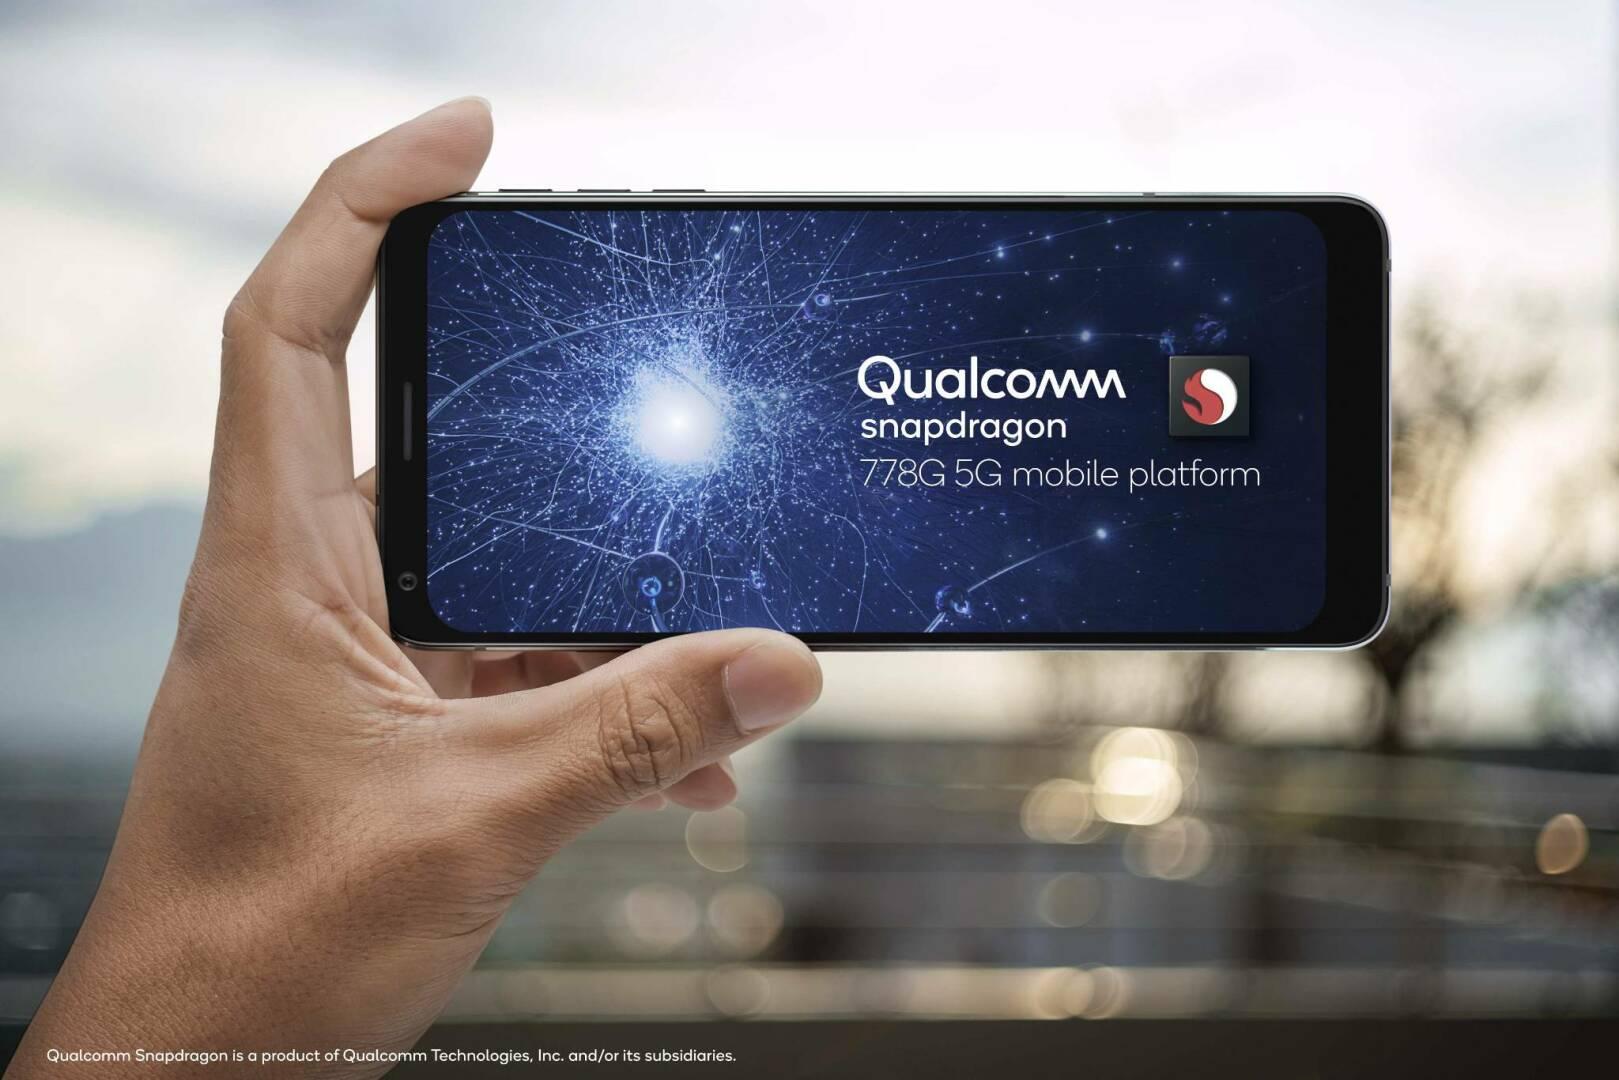 Qualcomm Snapdragon 778G 5G